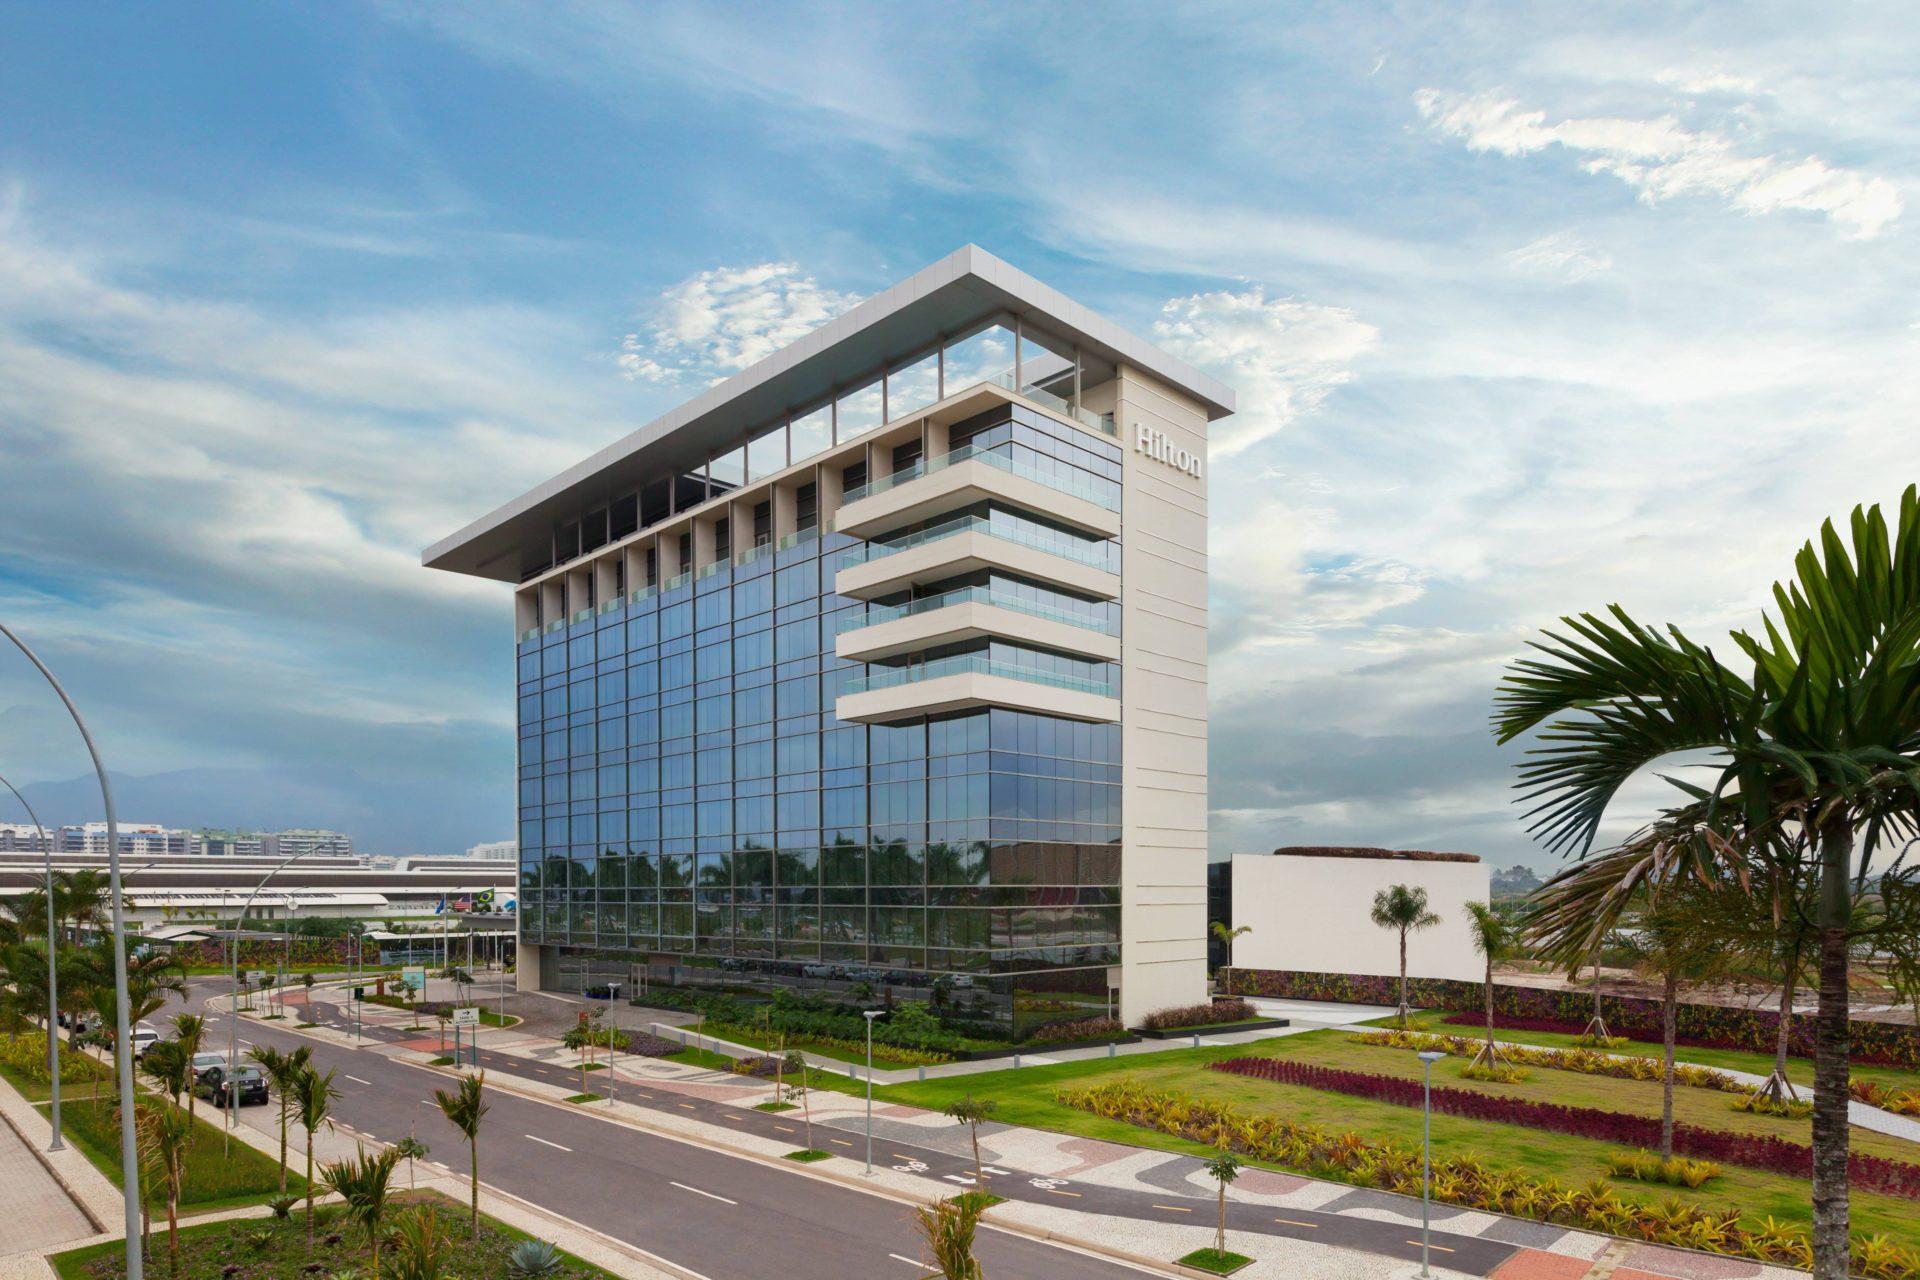 Hilton Barra Rio de Janeiro - Exterior - 1043312